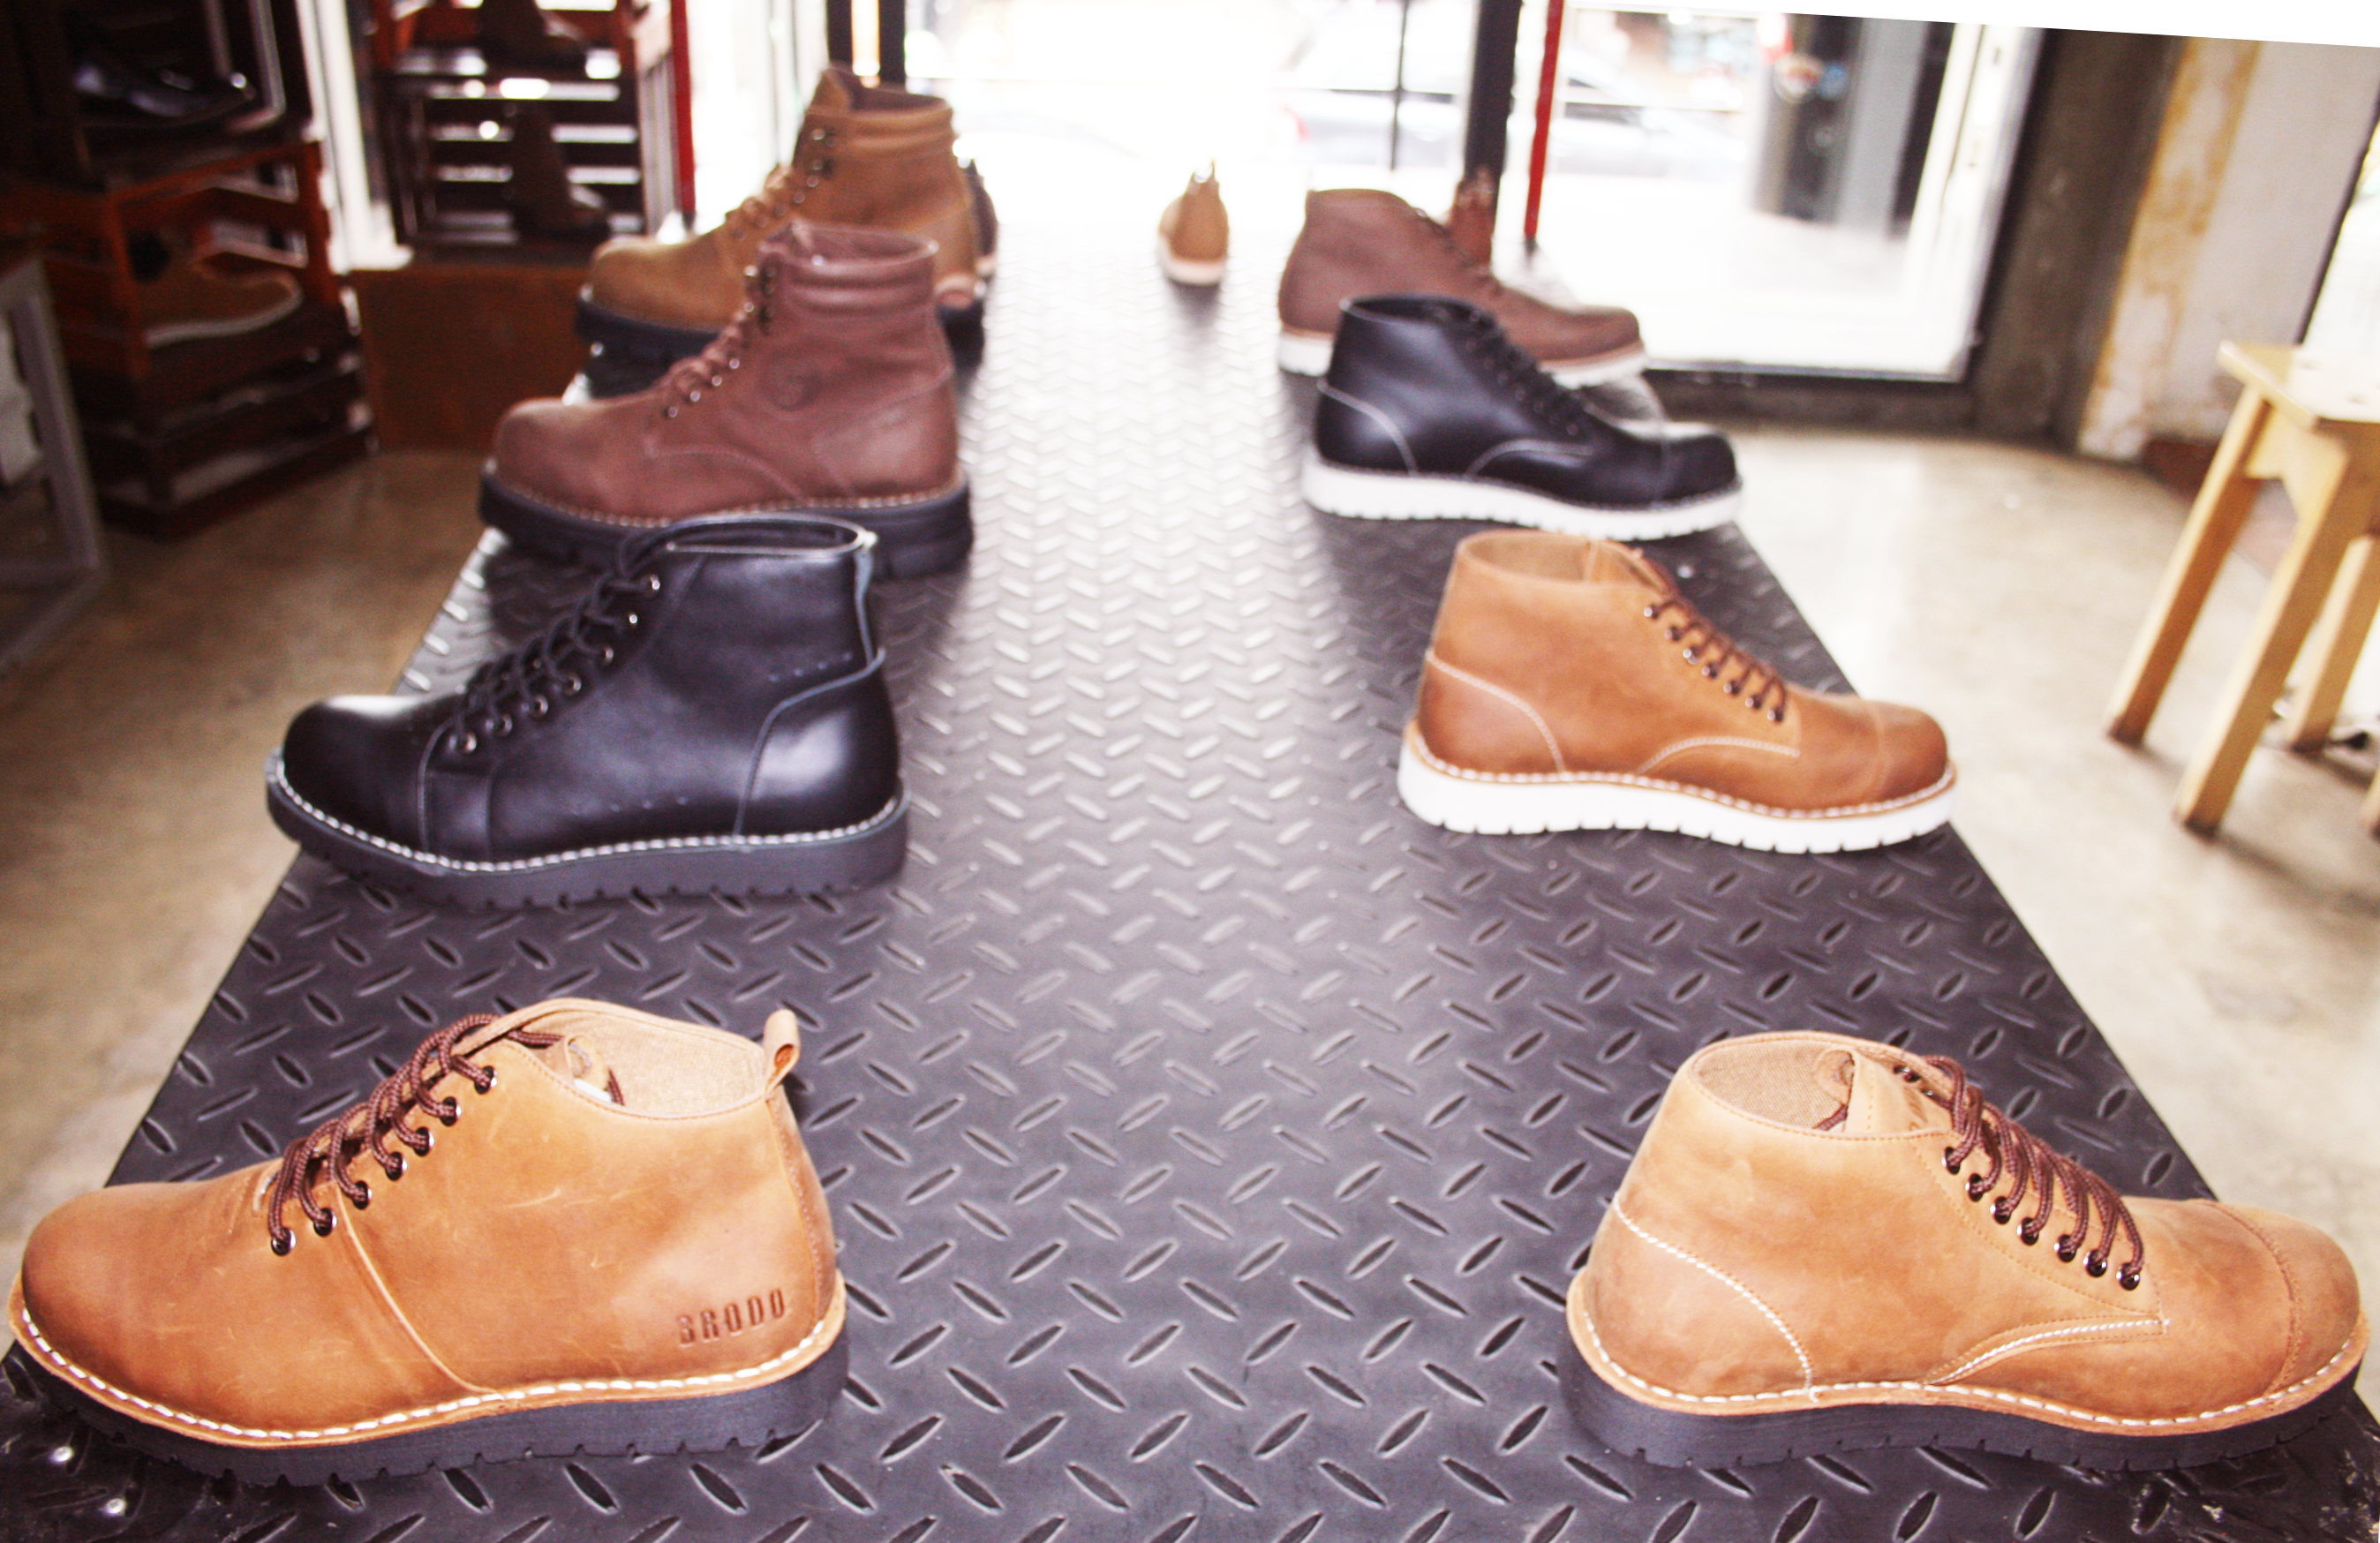 Yukka Harlanda Pebisnis Sepatu Kulit Tajir Bermodal Rp 7 Juta